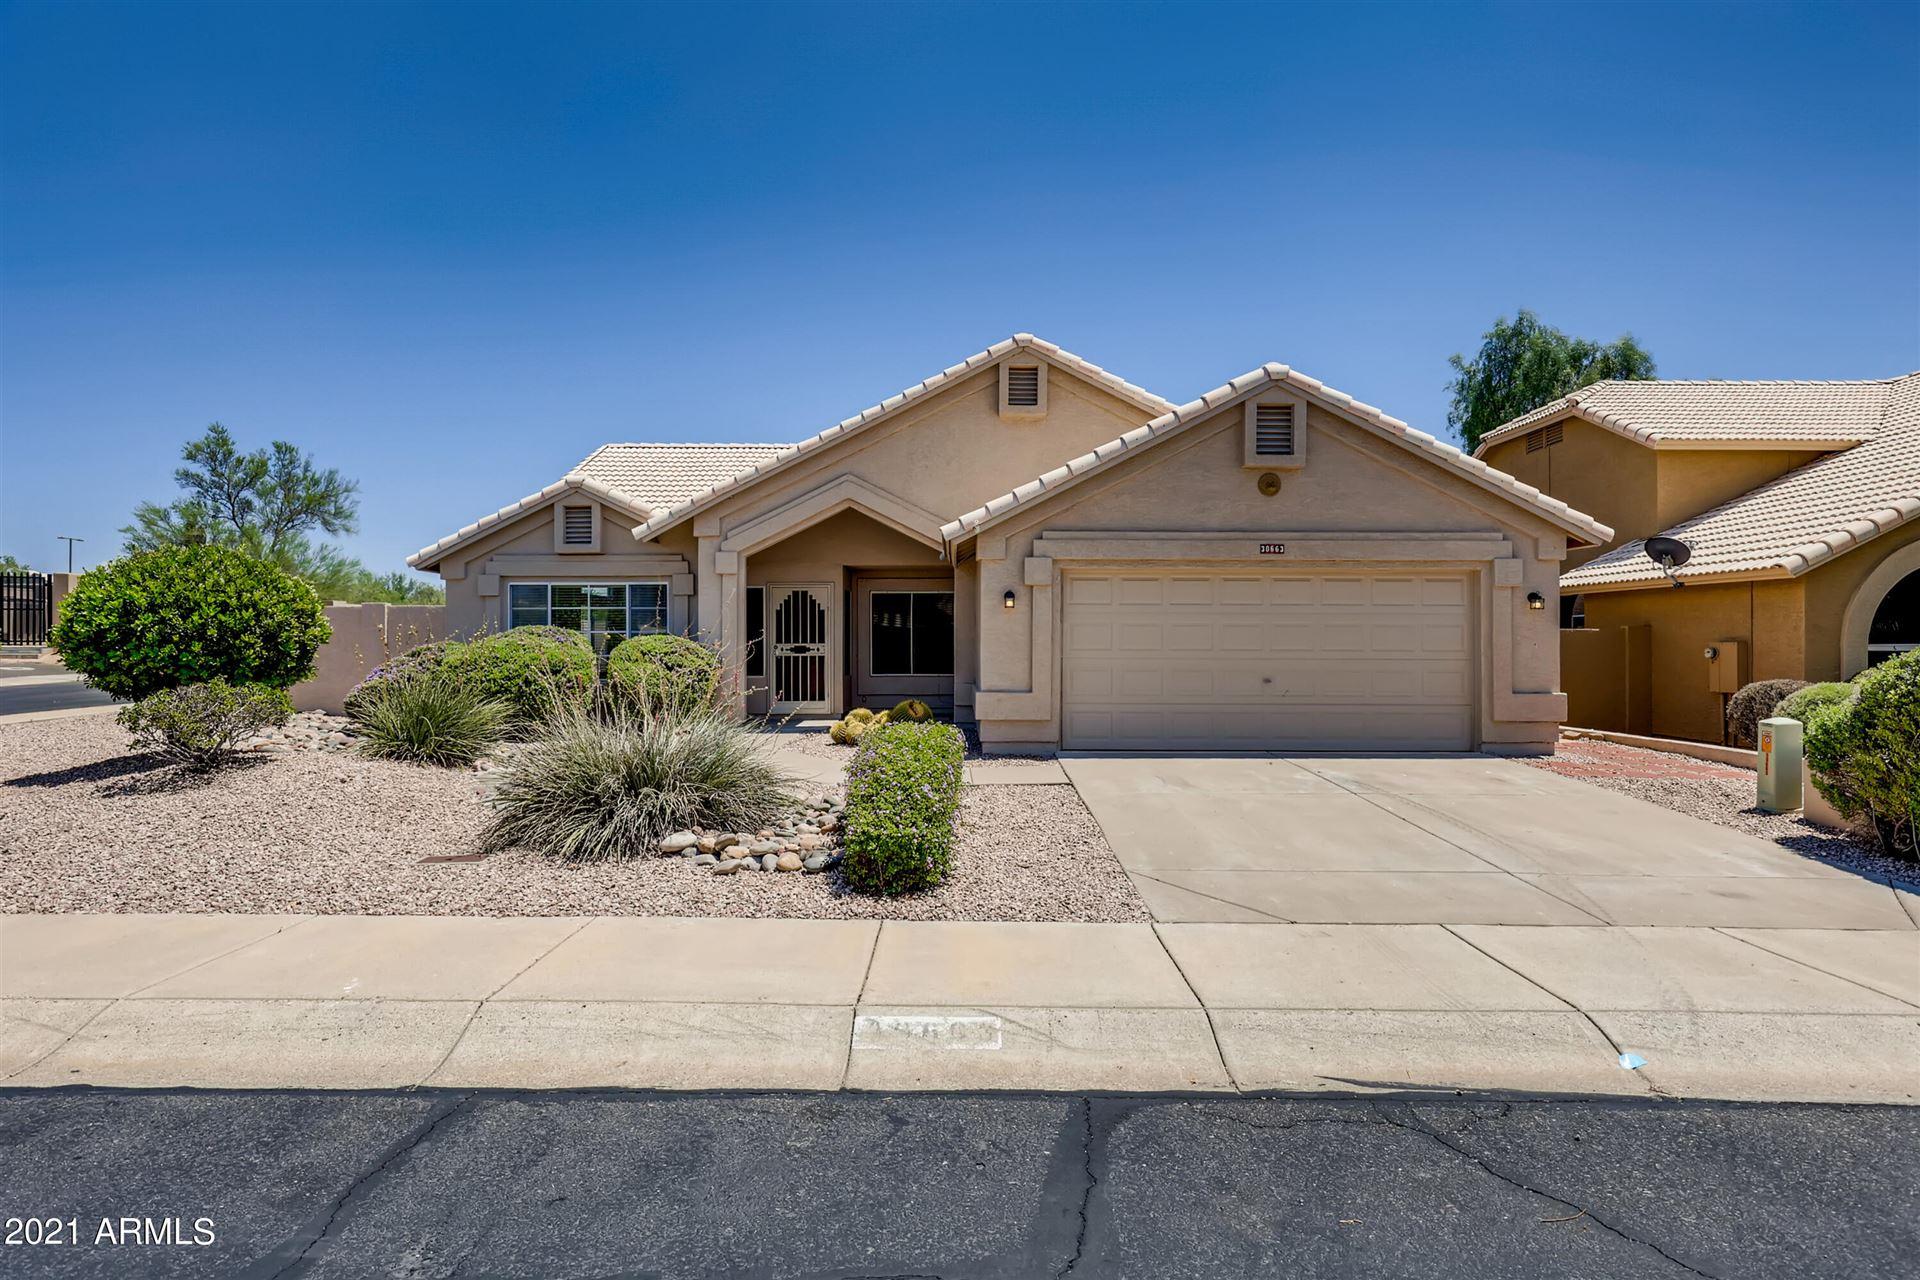 30663 N 44TH Street, Cave Creek, AZ 85331 - MLS#: 6273777